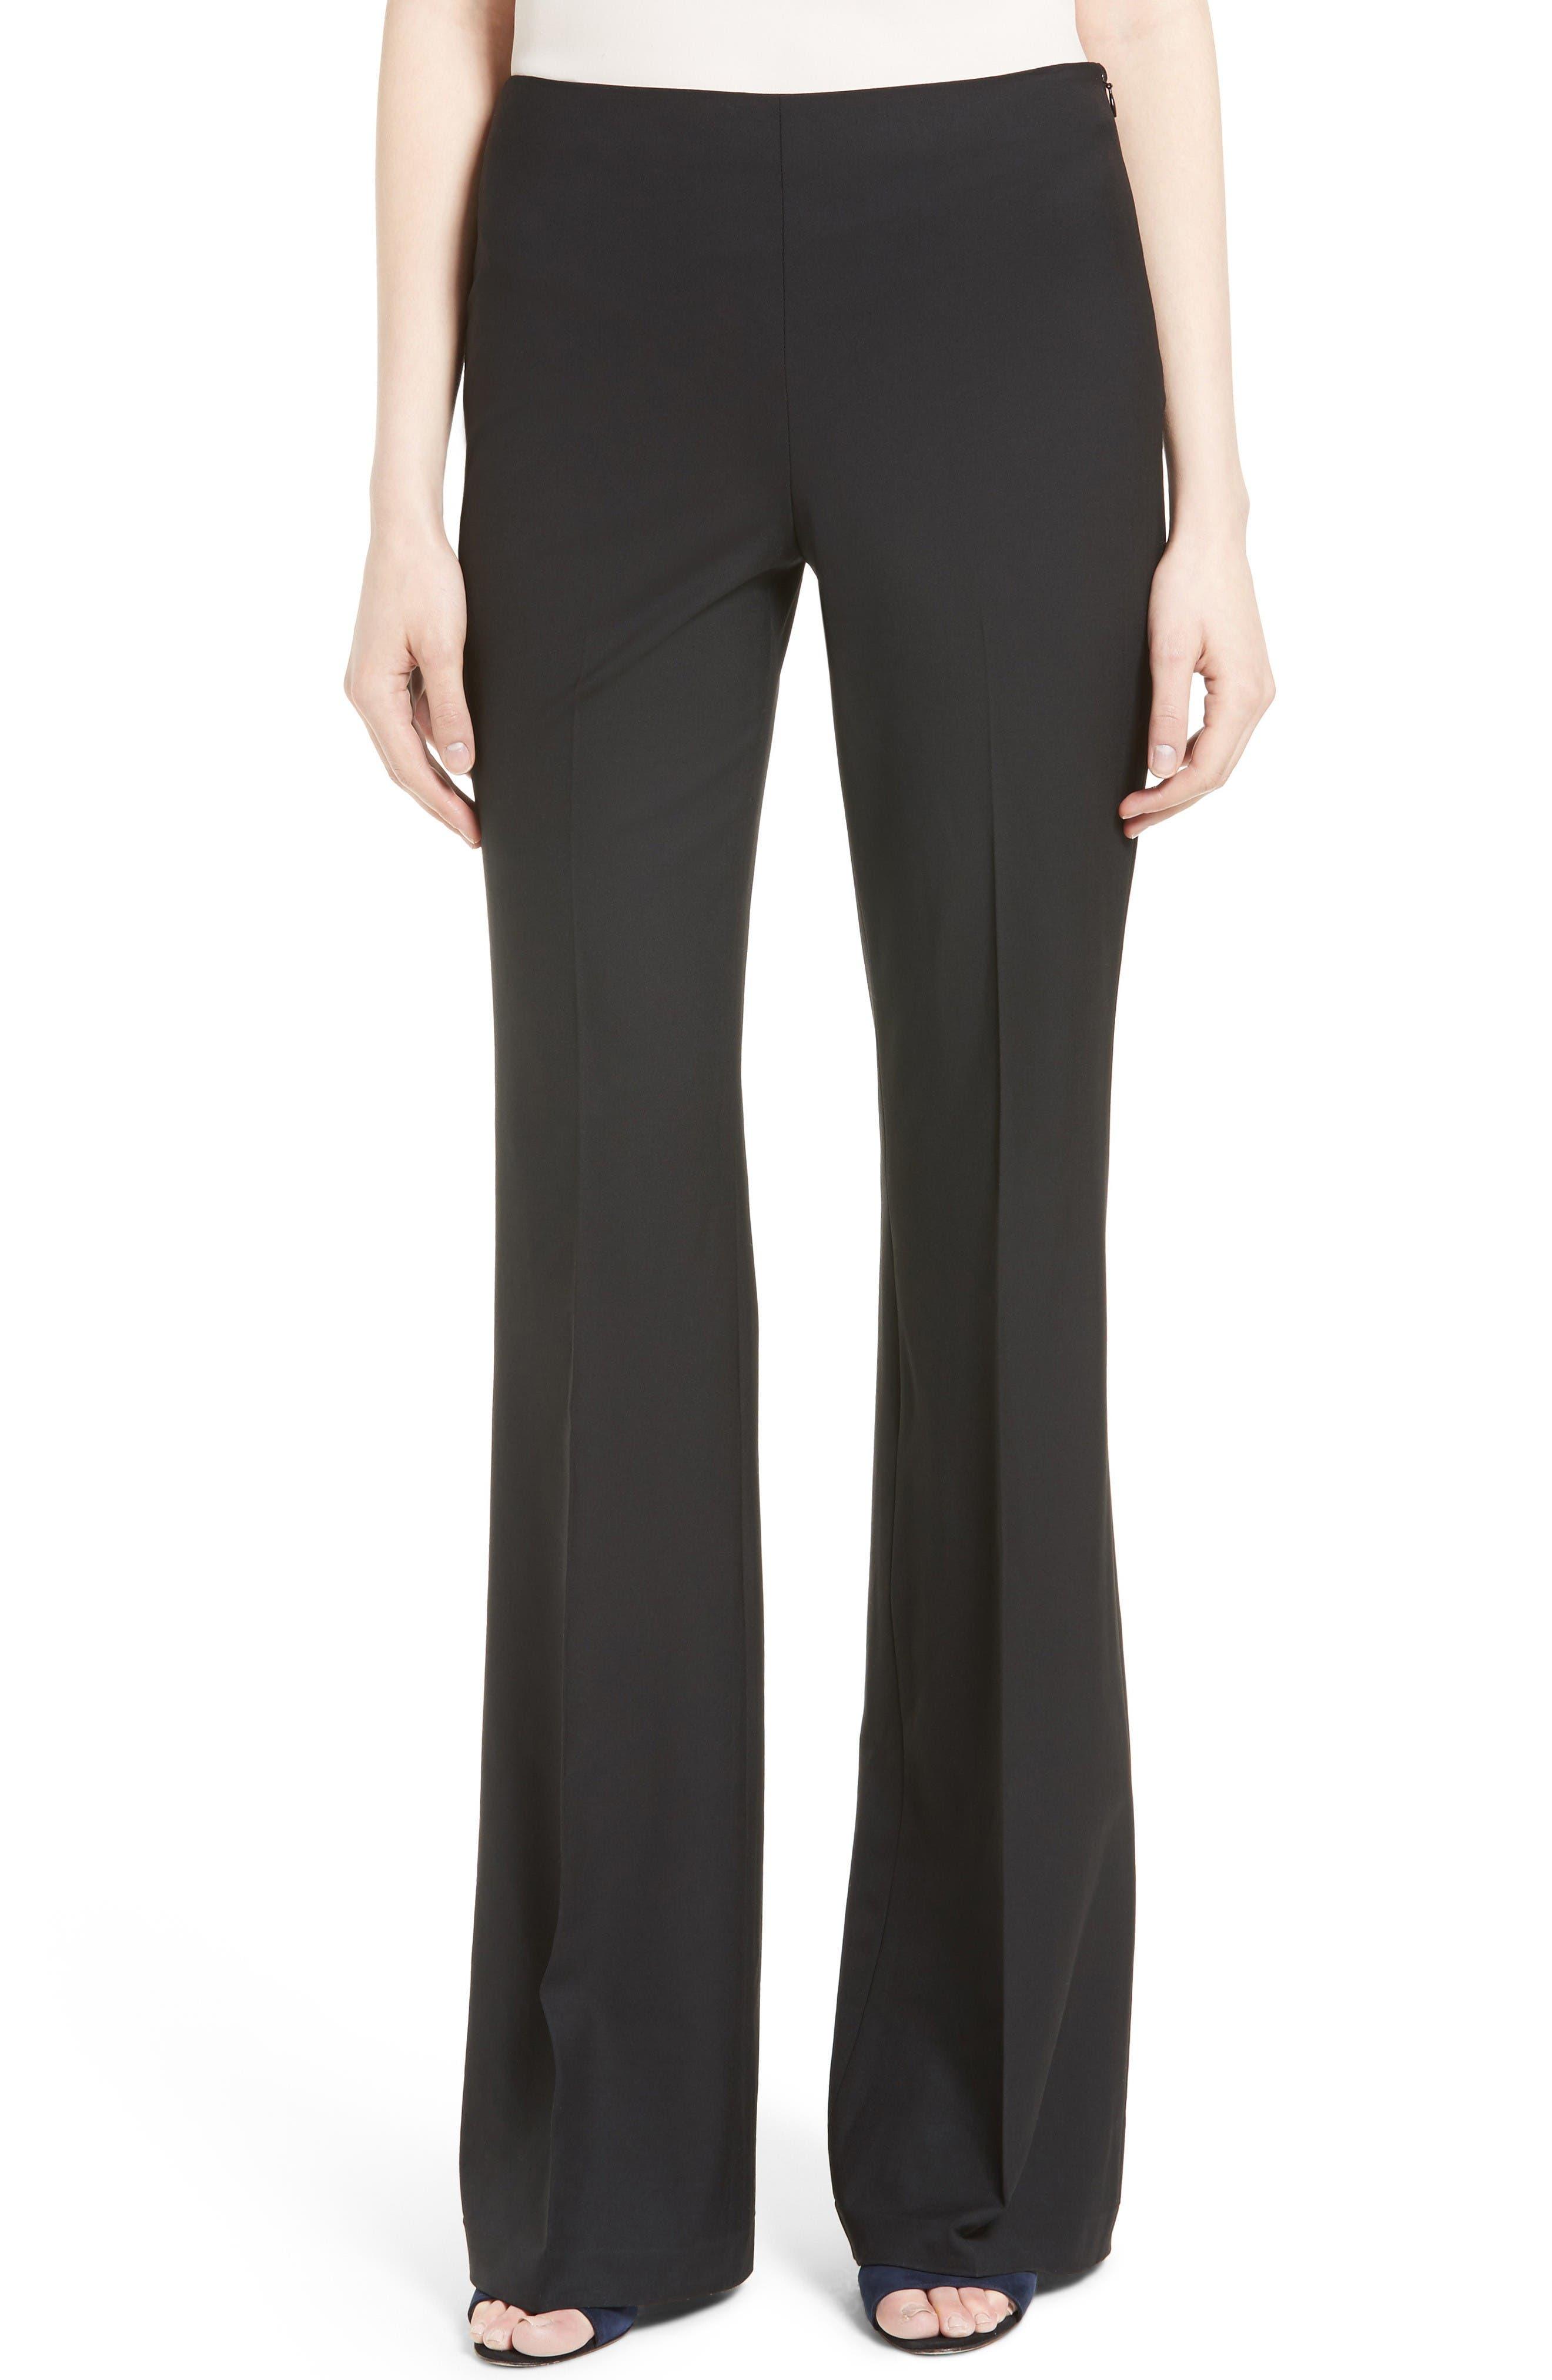 Demitria Flare Leg Good Wool Suit Pants,                             Main thumbnail 1, color,                             Black